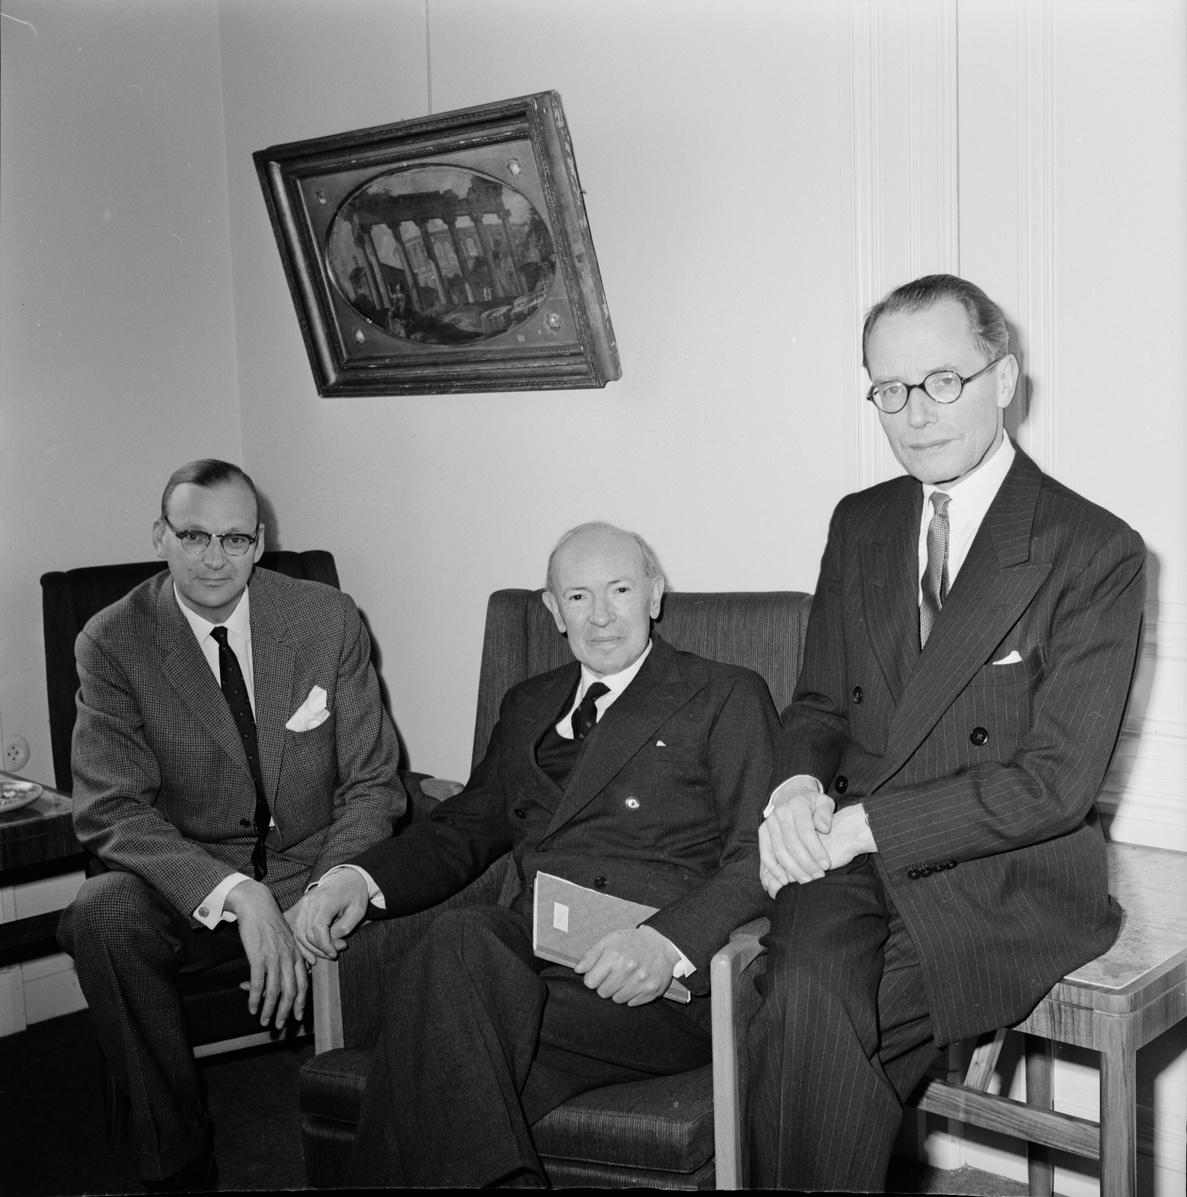 Allardyce Nicoll (middle) visiting [[Uppsala University